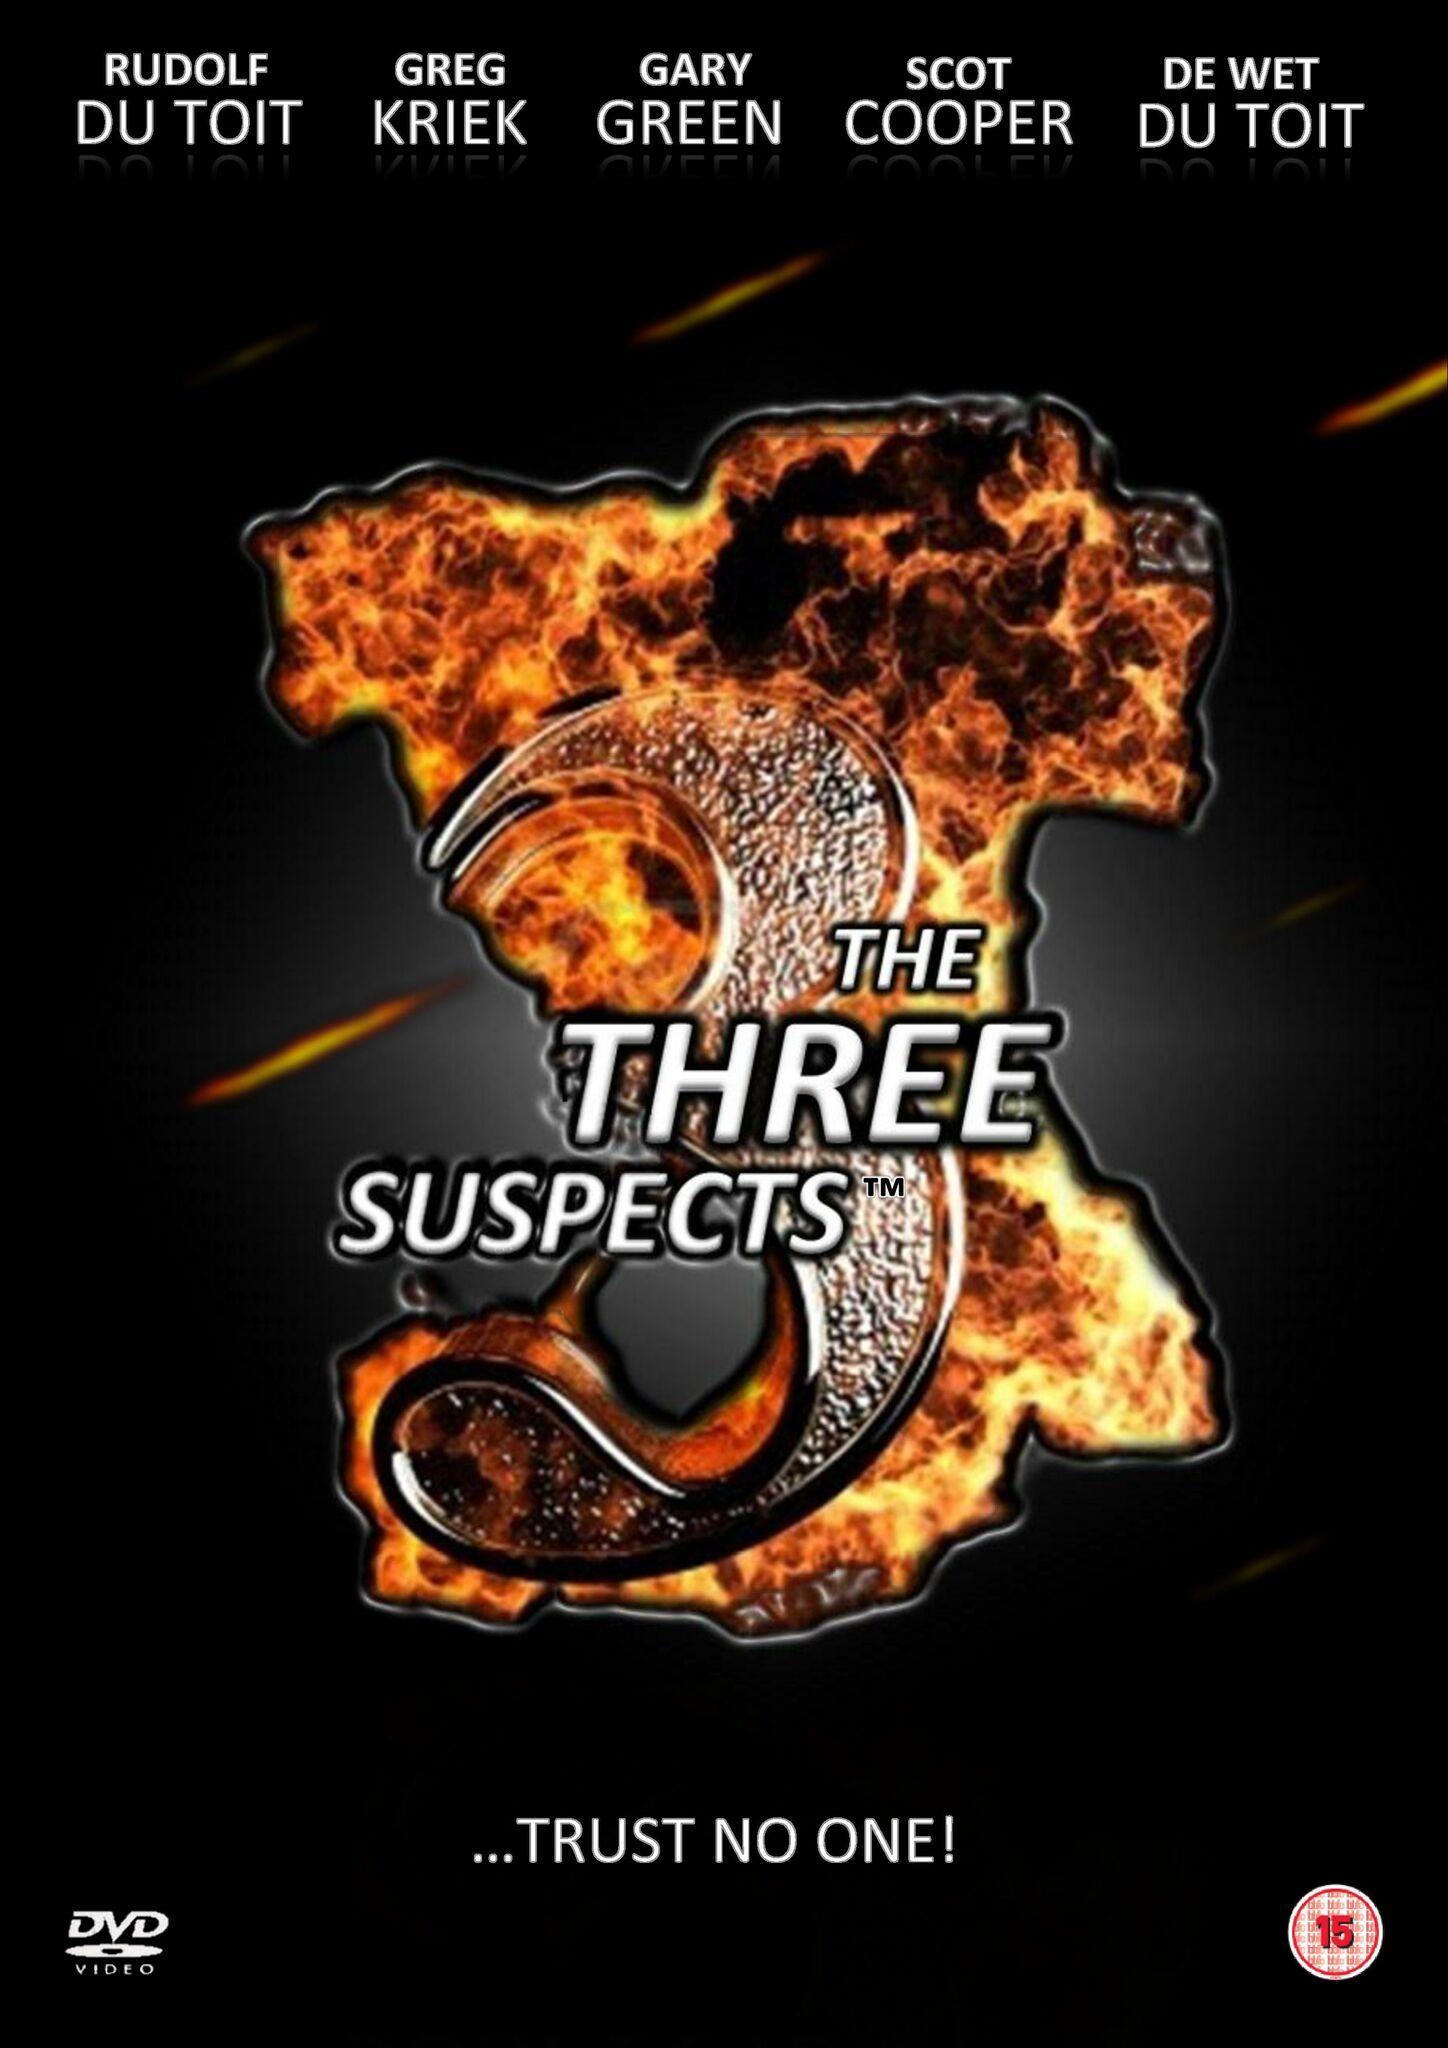 The Three Suspects